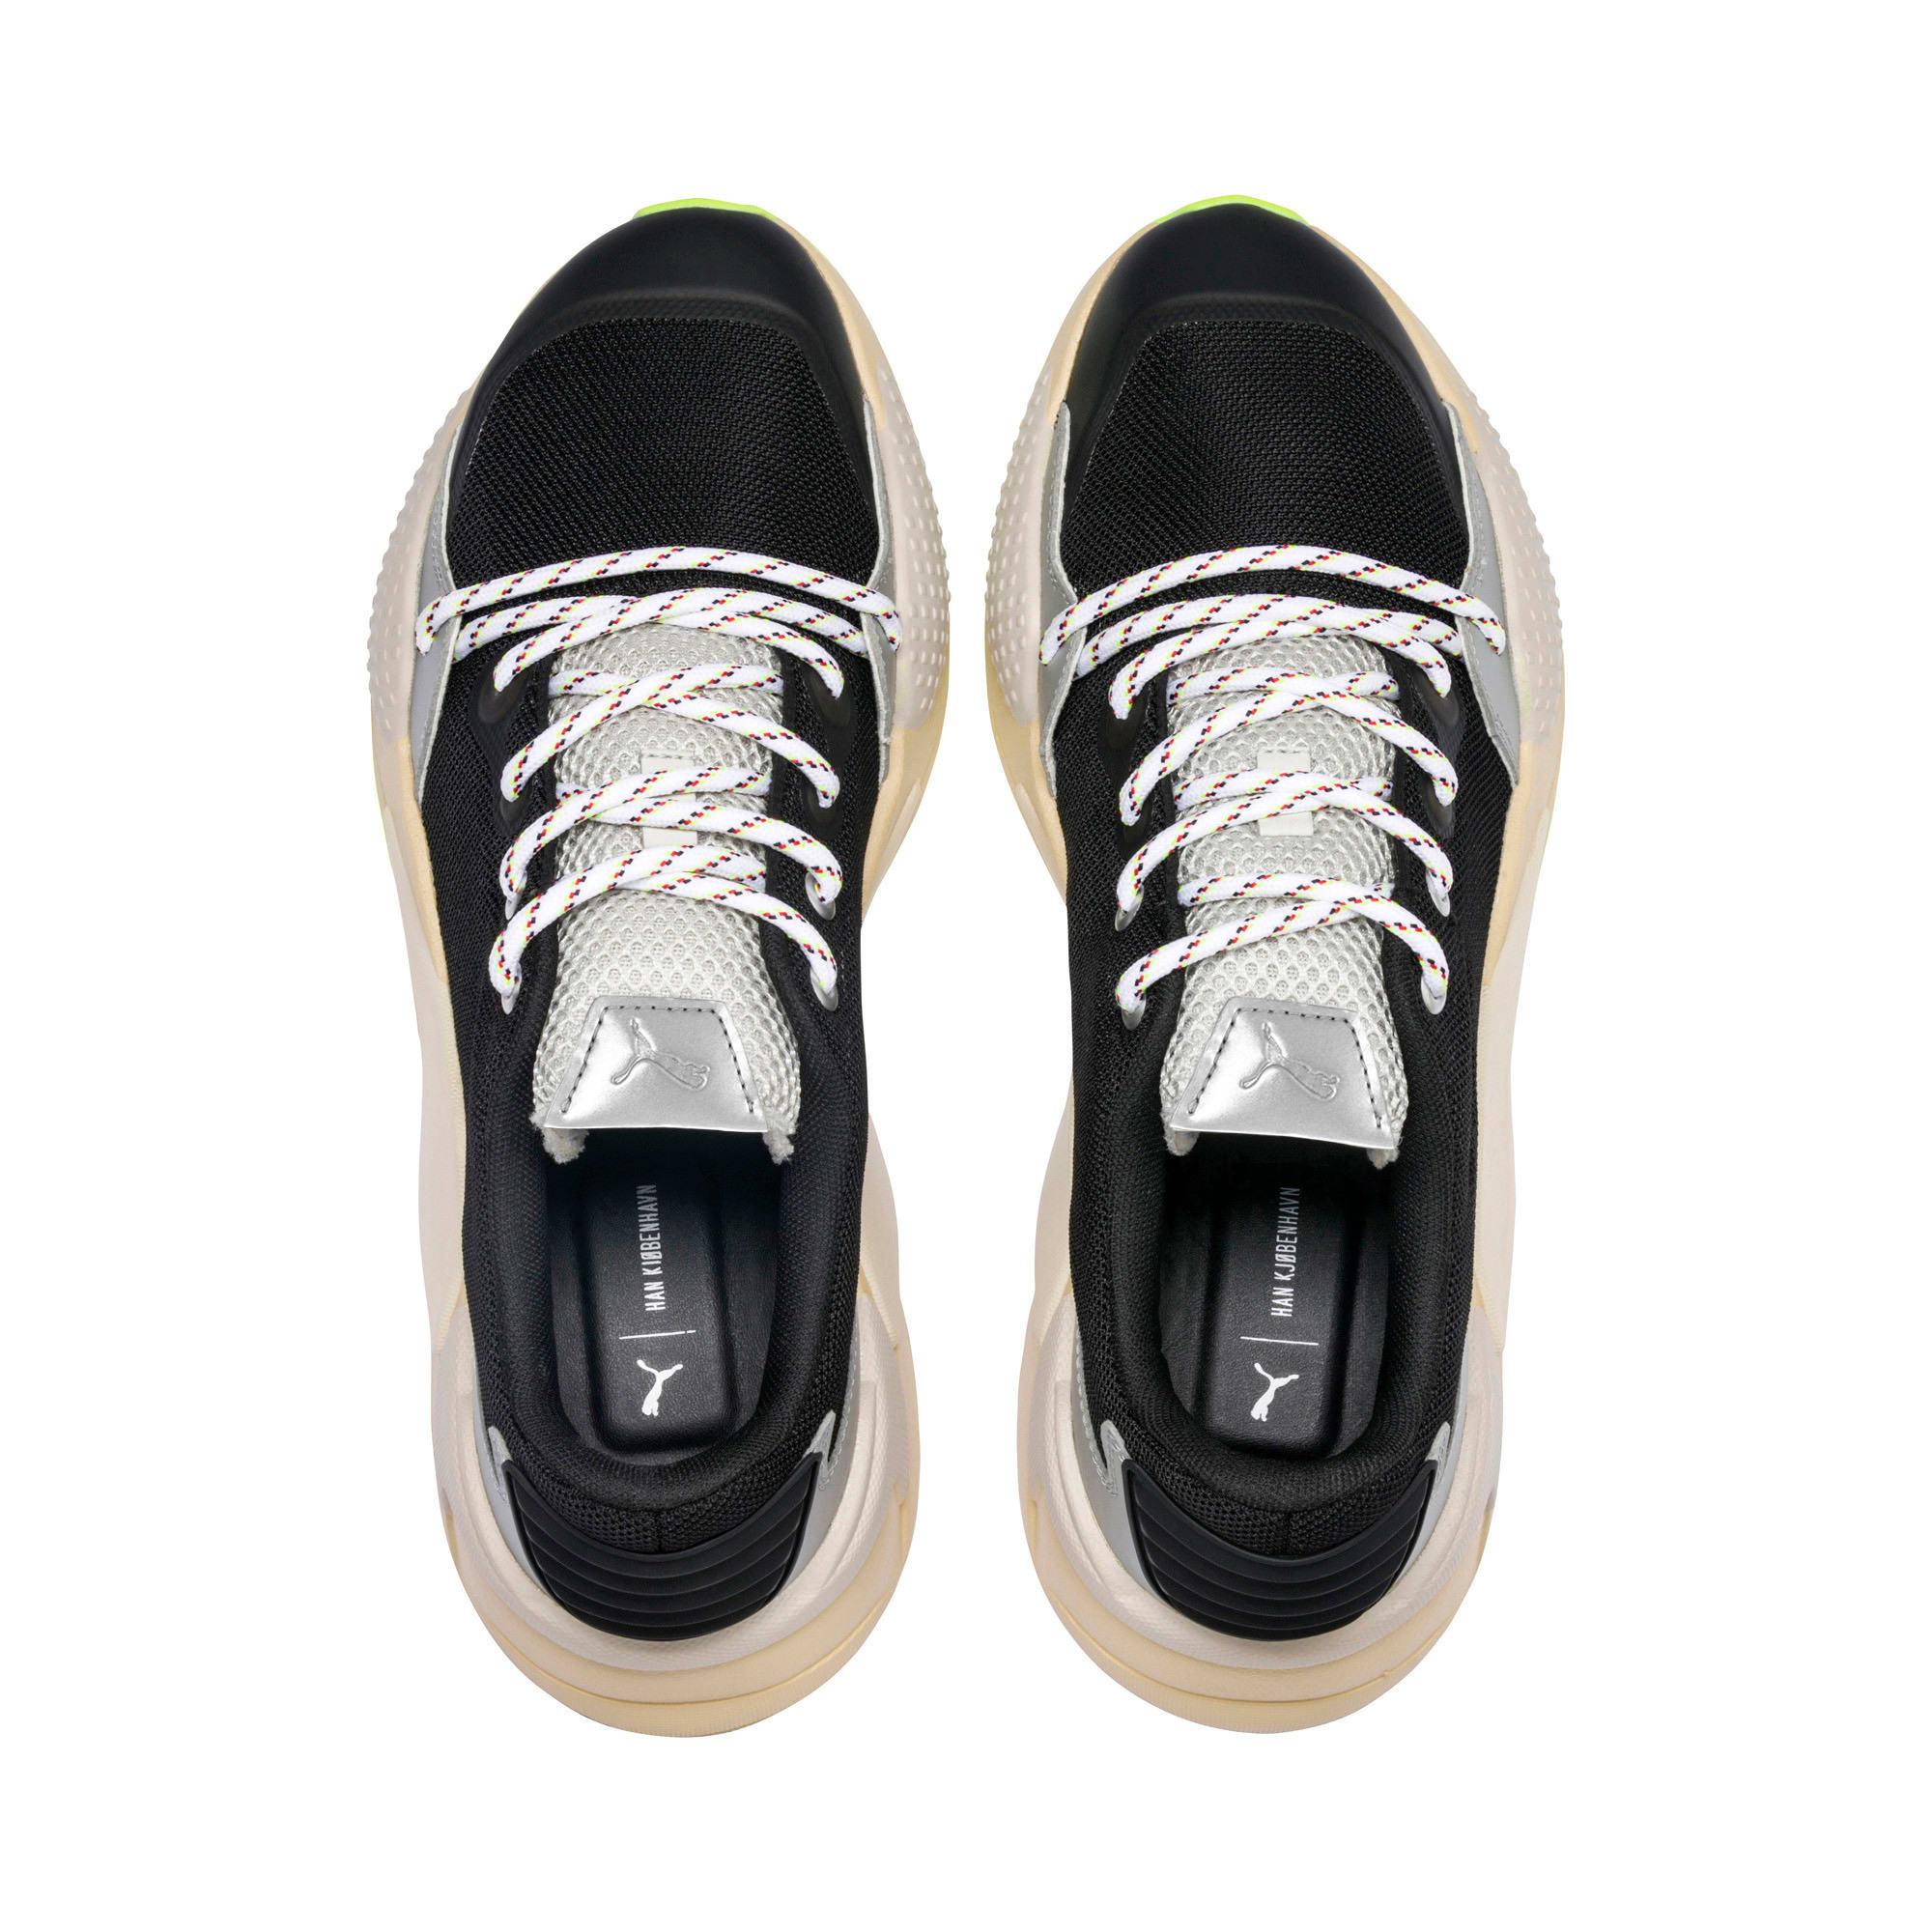 Thumbnail 8 of PUMA x HAN KJØBENHAVN RS-X Sneakers, Puma Black-Puma Silver, medium